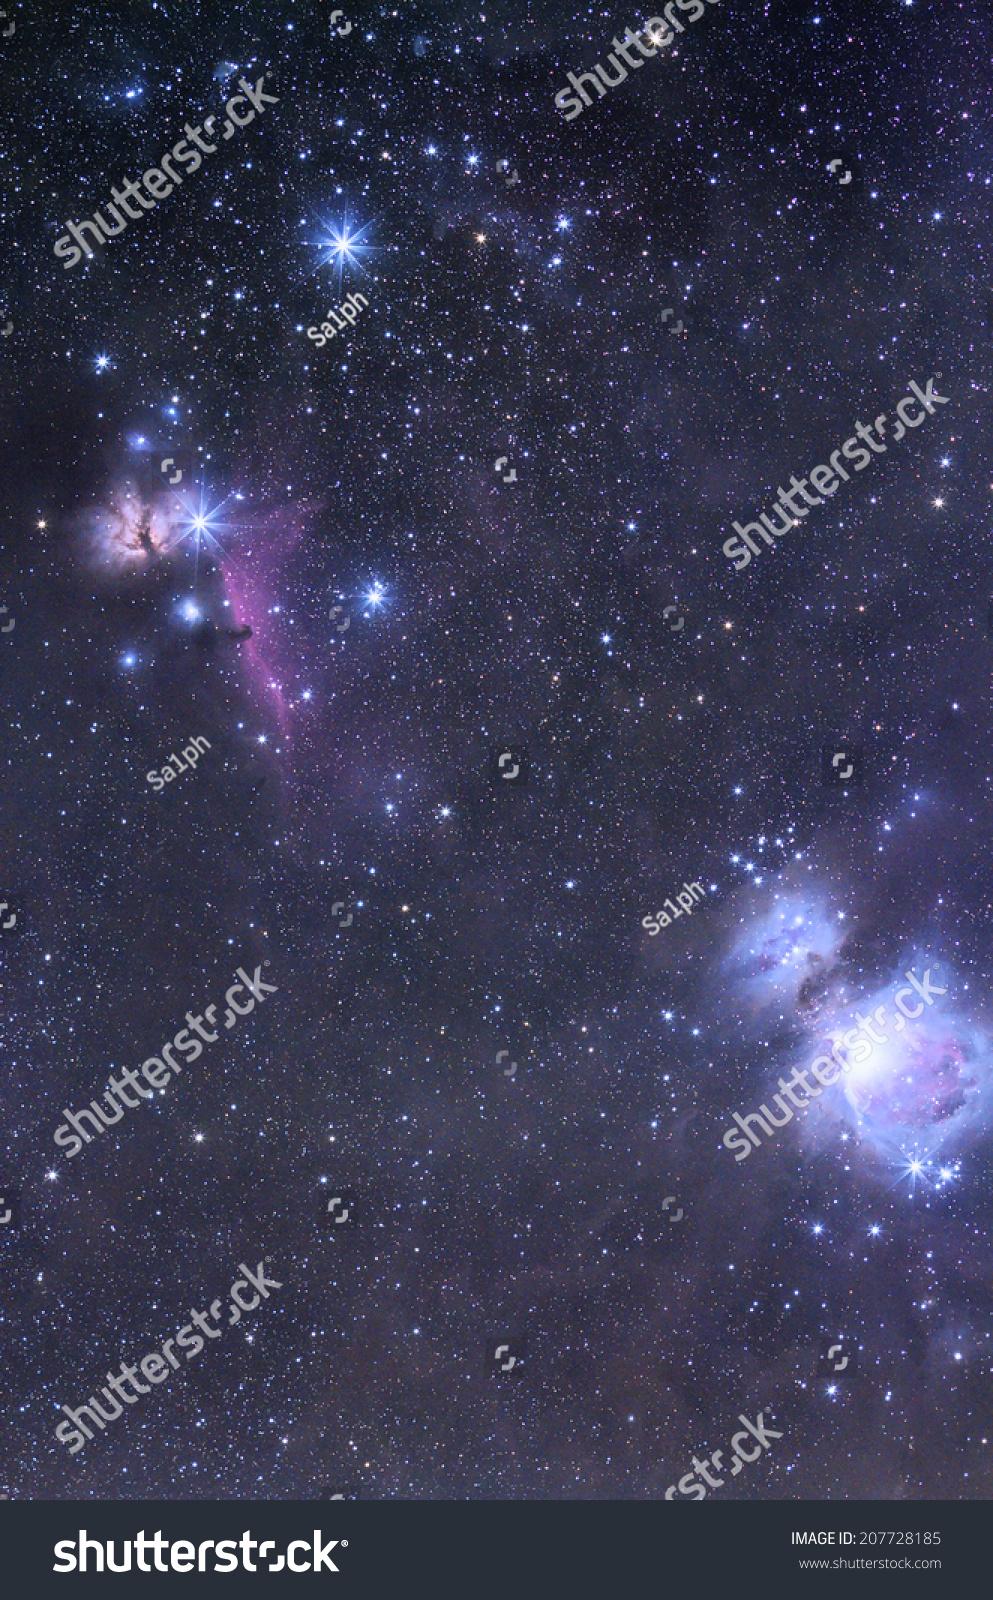 orion nebula high resolution - photo #48